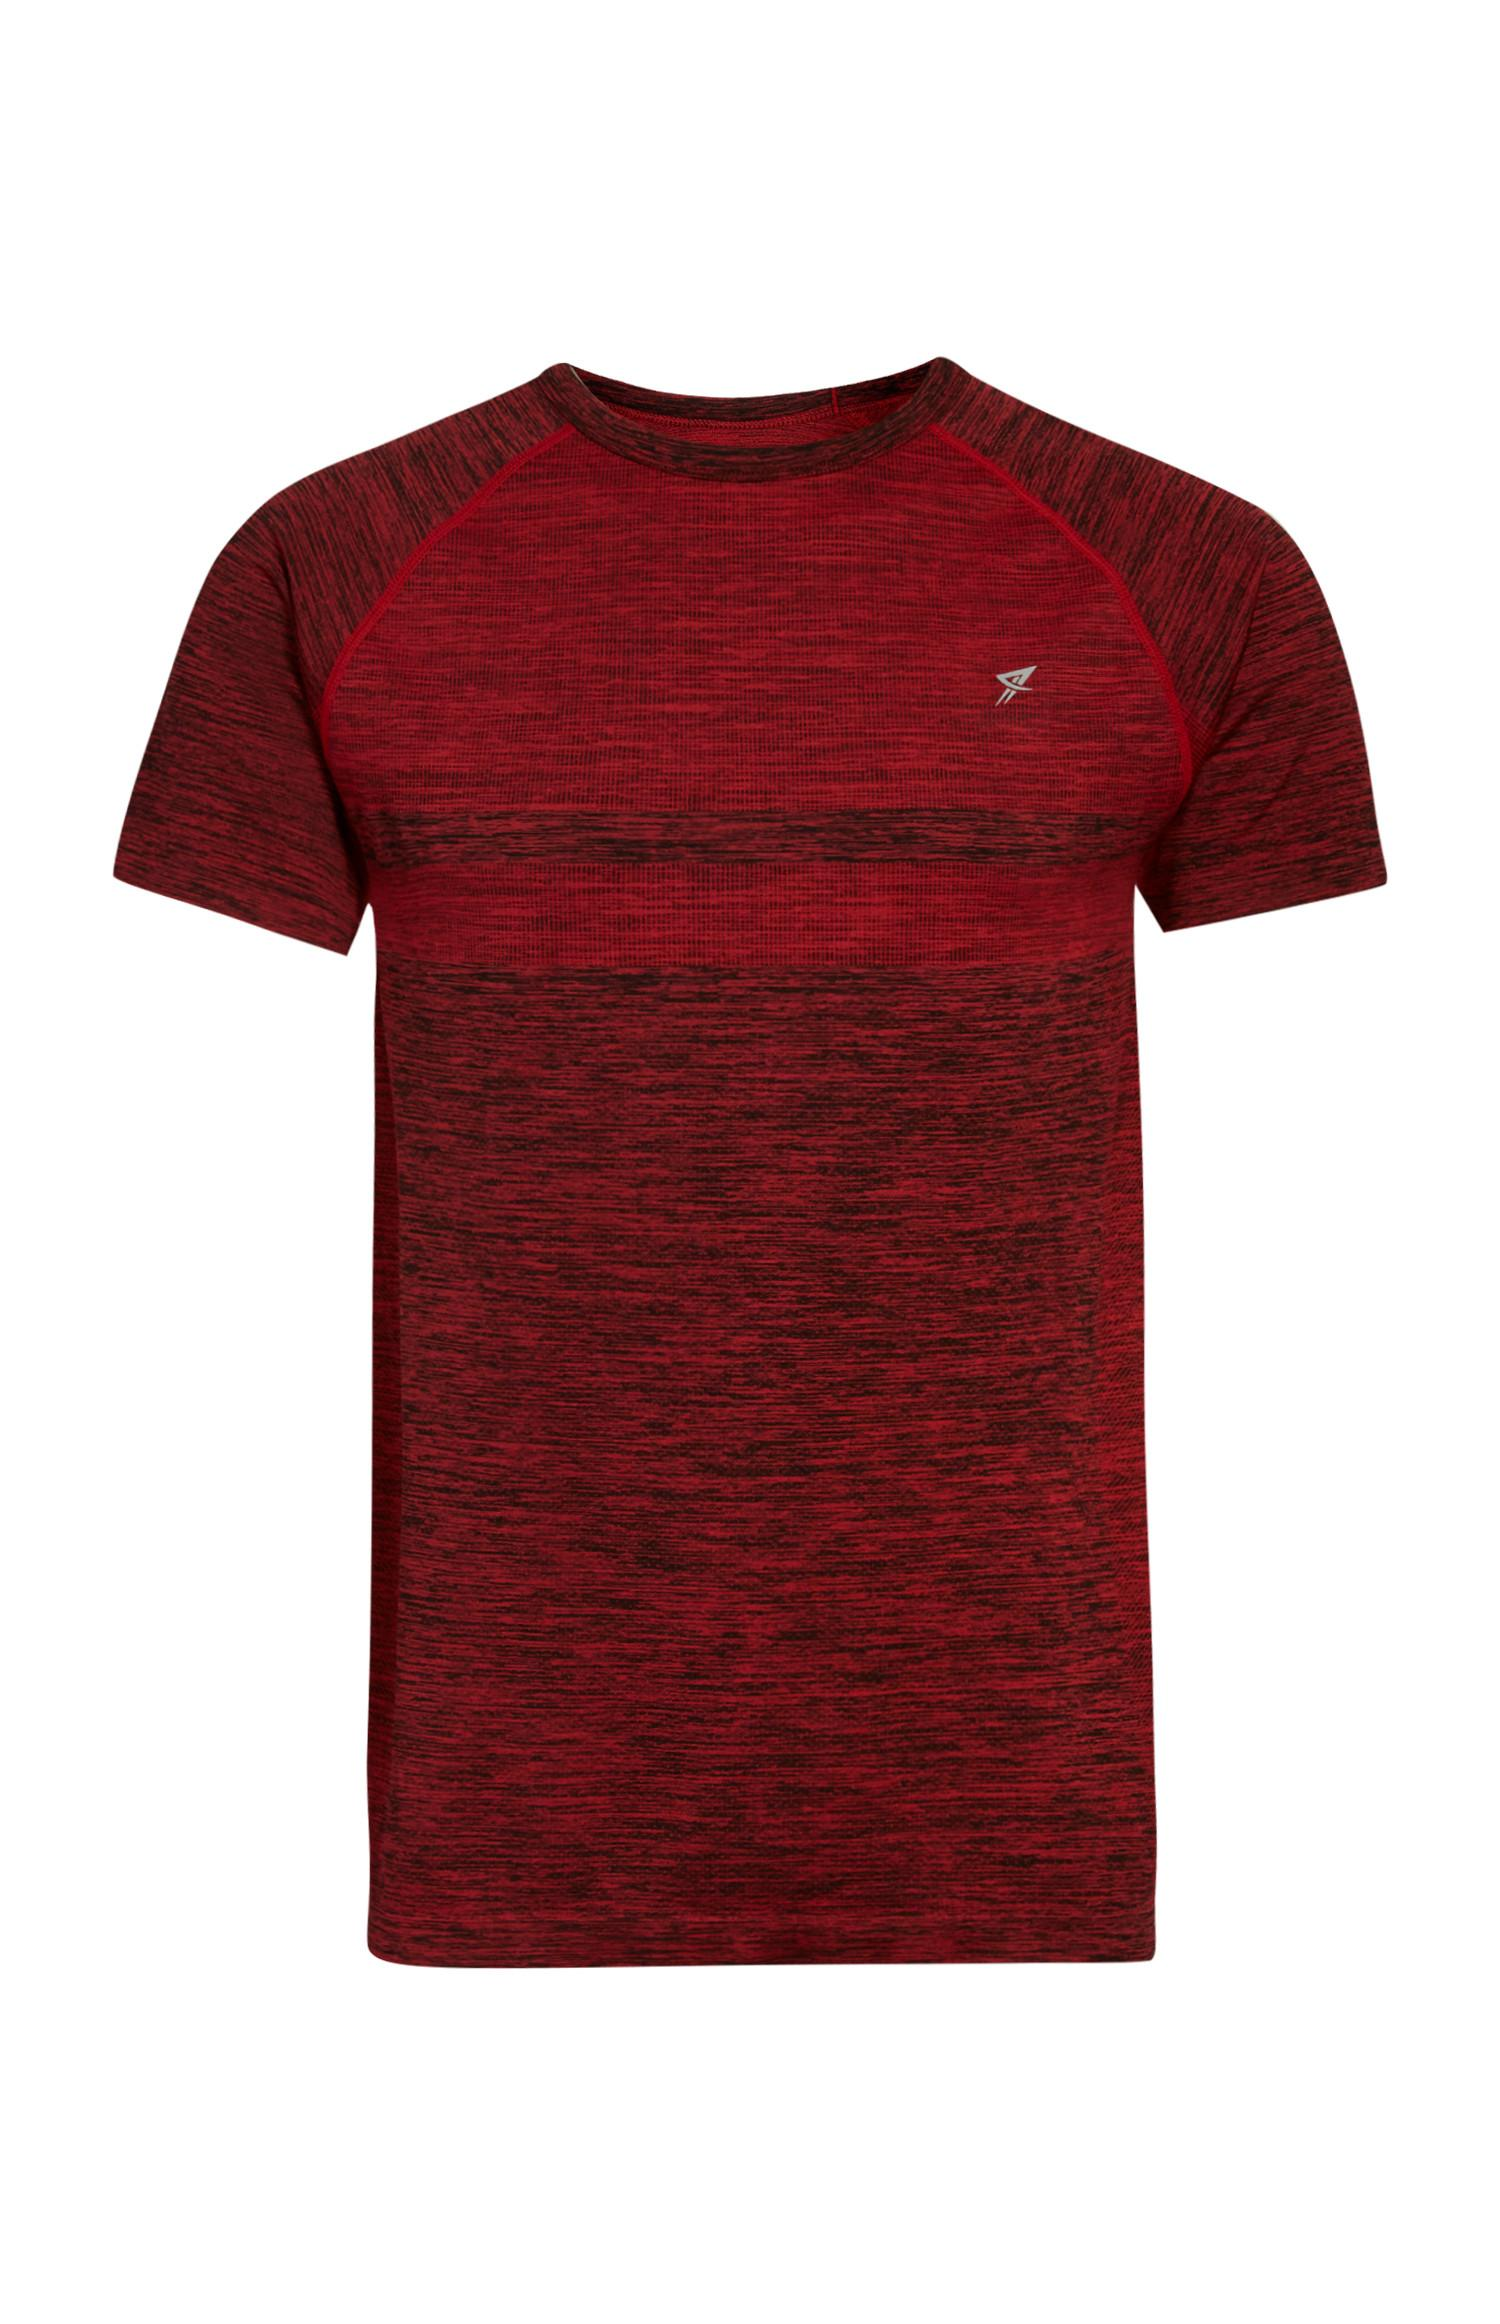 T-shirt desportiva vermelha